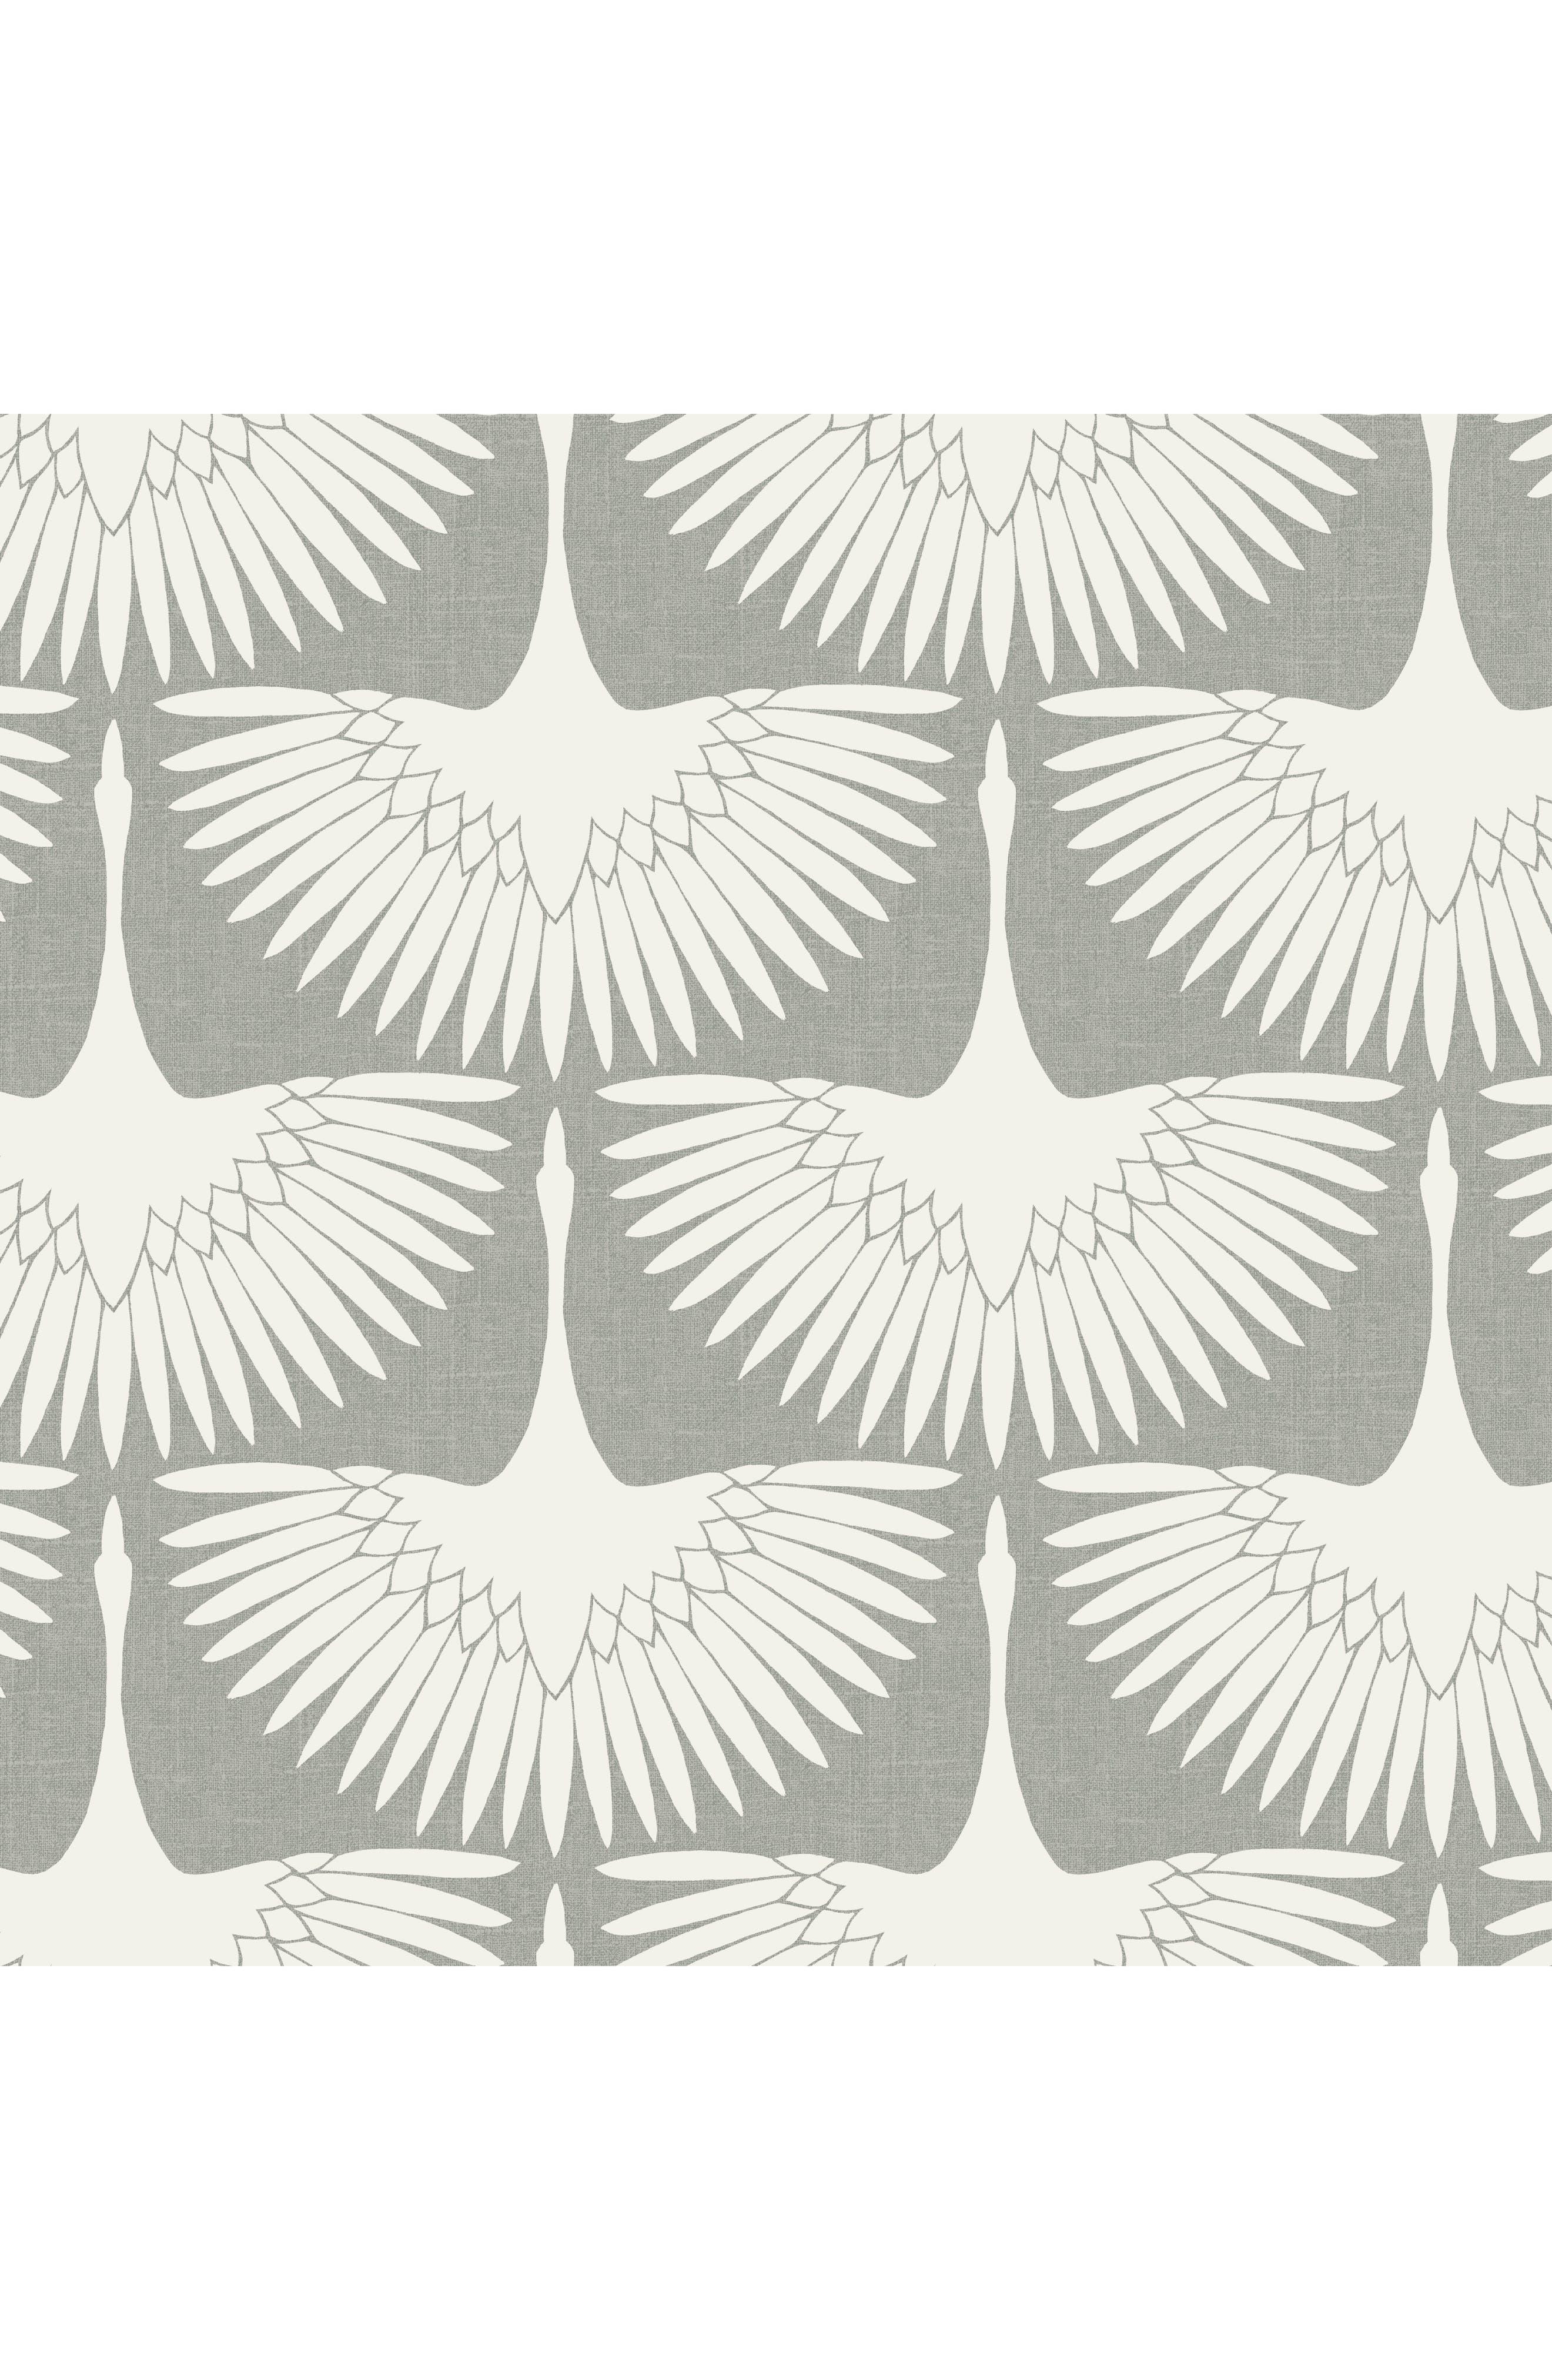 TEMPAPER Feather Flock Vinyl Wallpaper, Main, color, 900